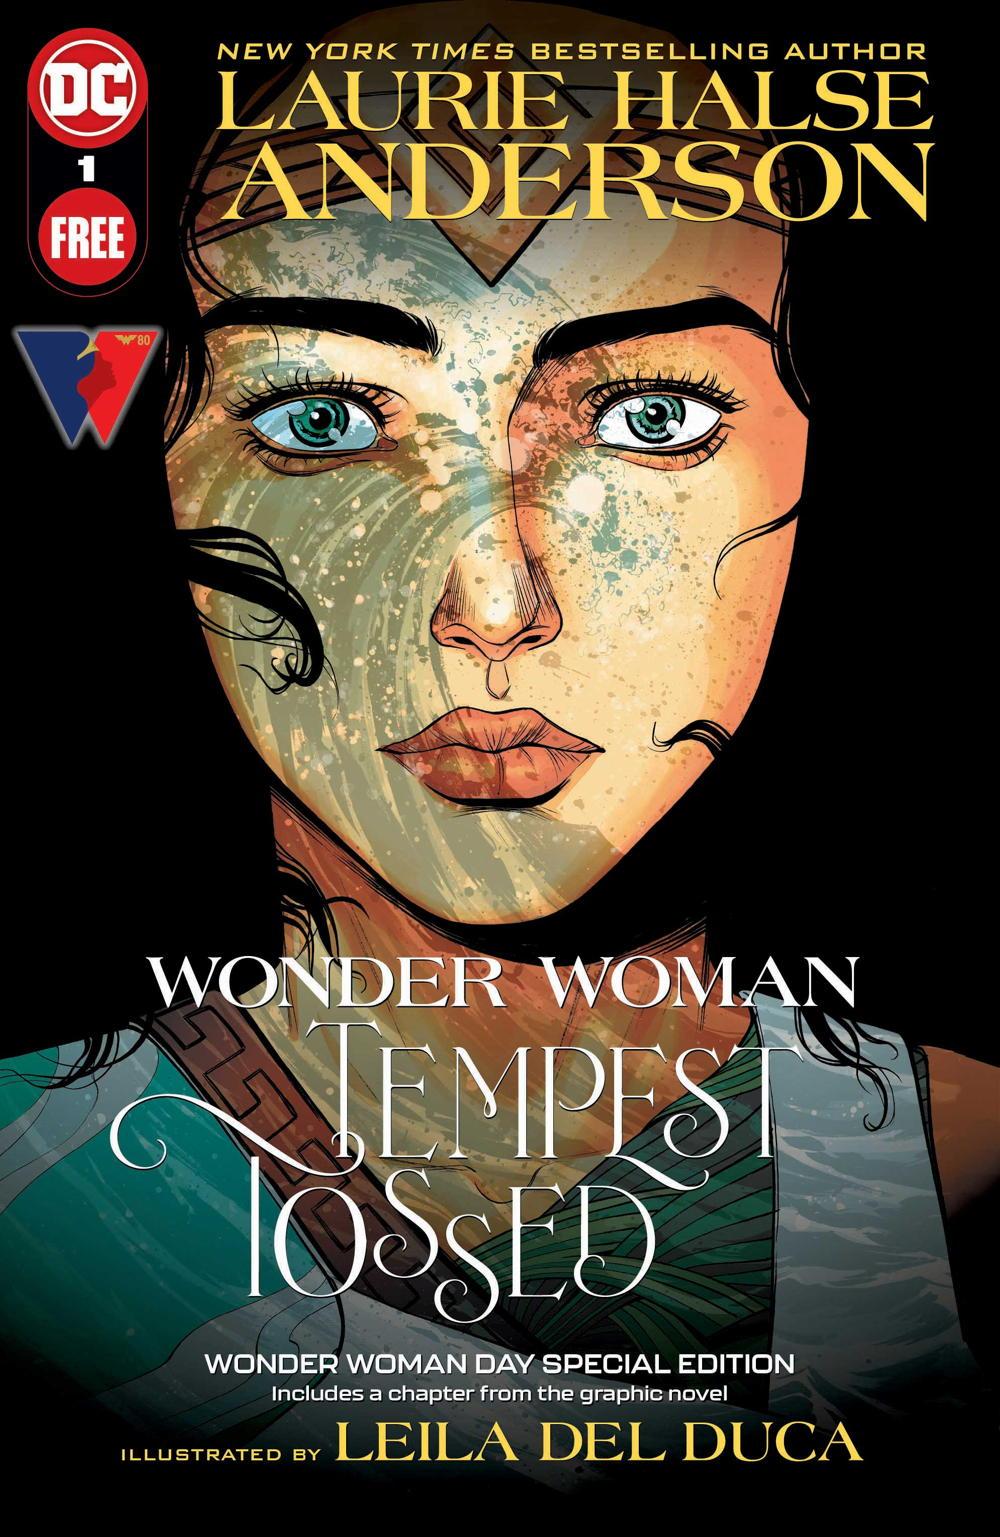 WW_DAY_2021_WONDER_WOMAN_TEMPEST_TOSSED.jpg